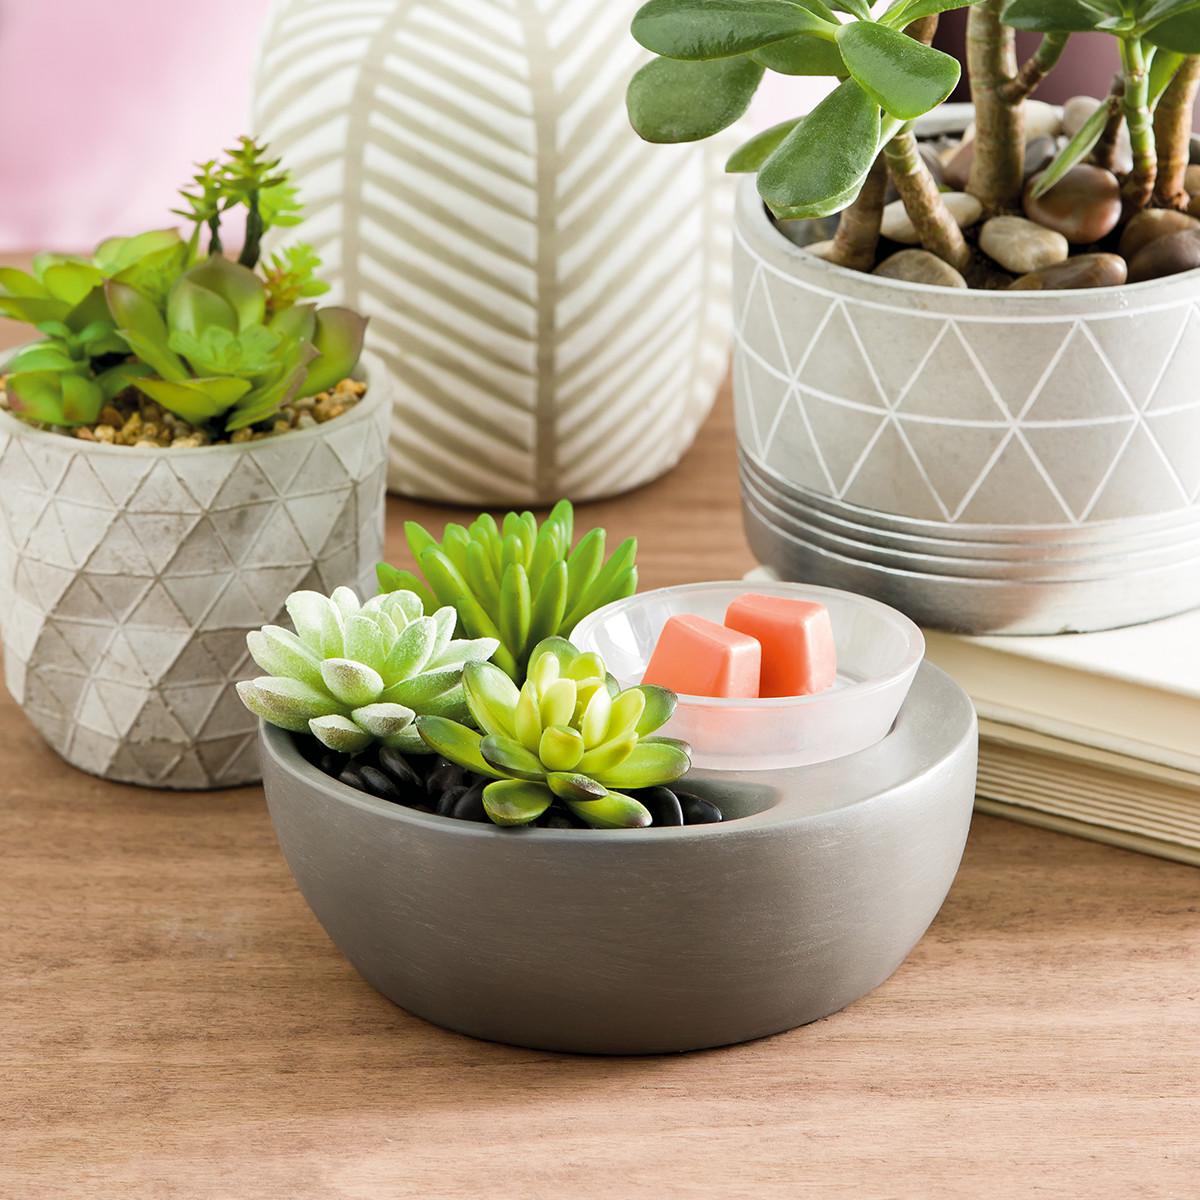 little garden scentsy warmer scentsy online store - Little Garden